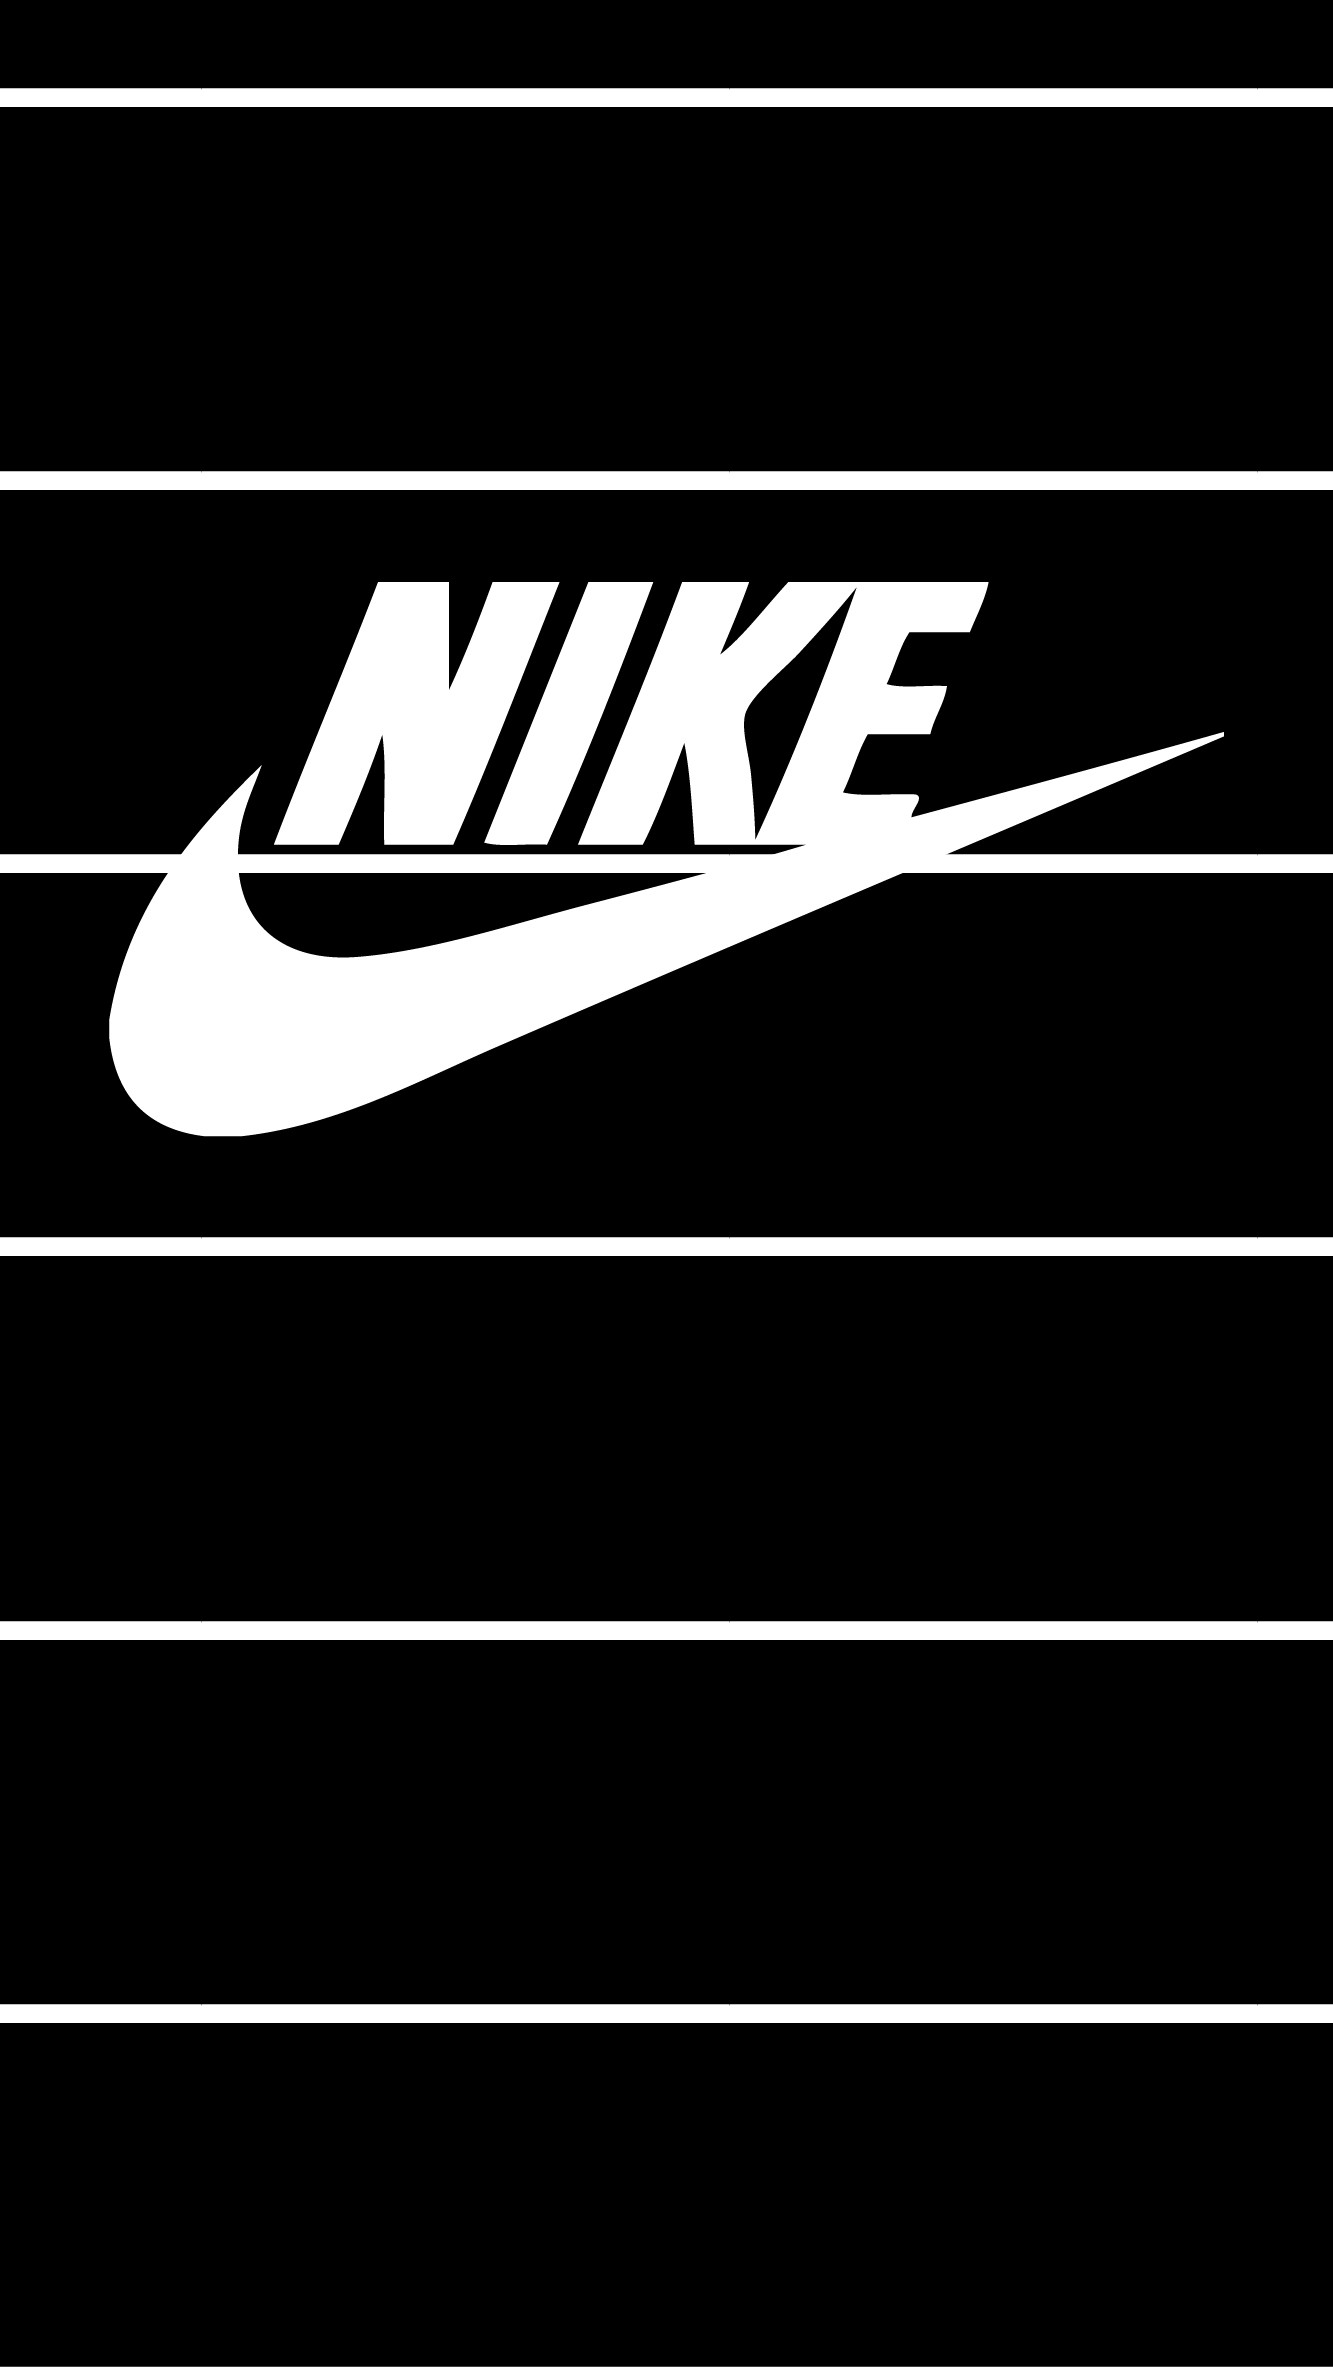 IPhone Nike Wallpaper HD (78+ images)